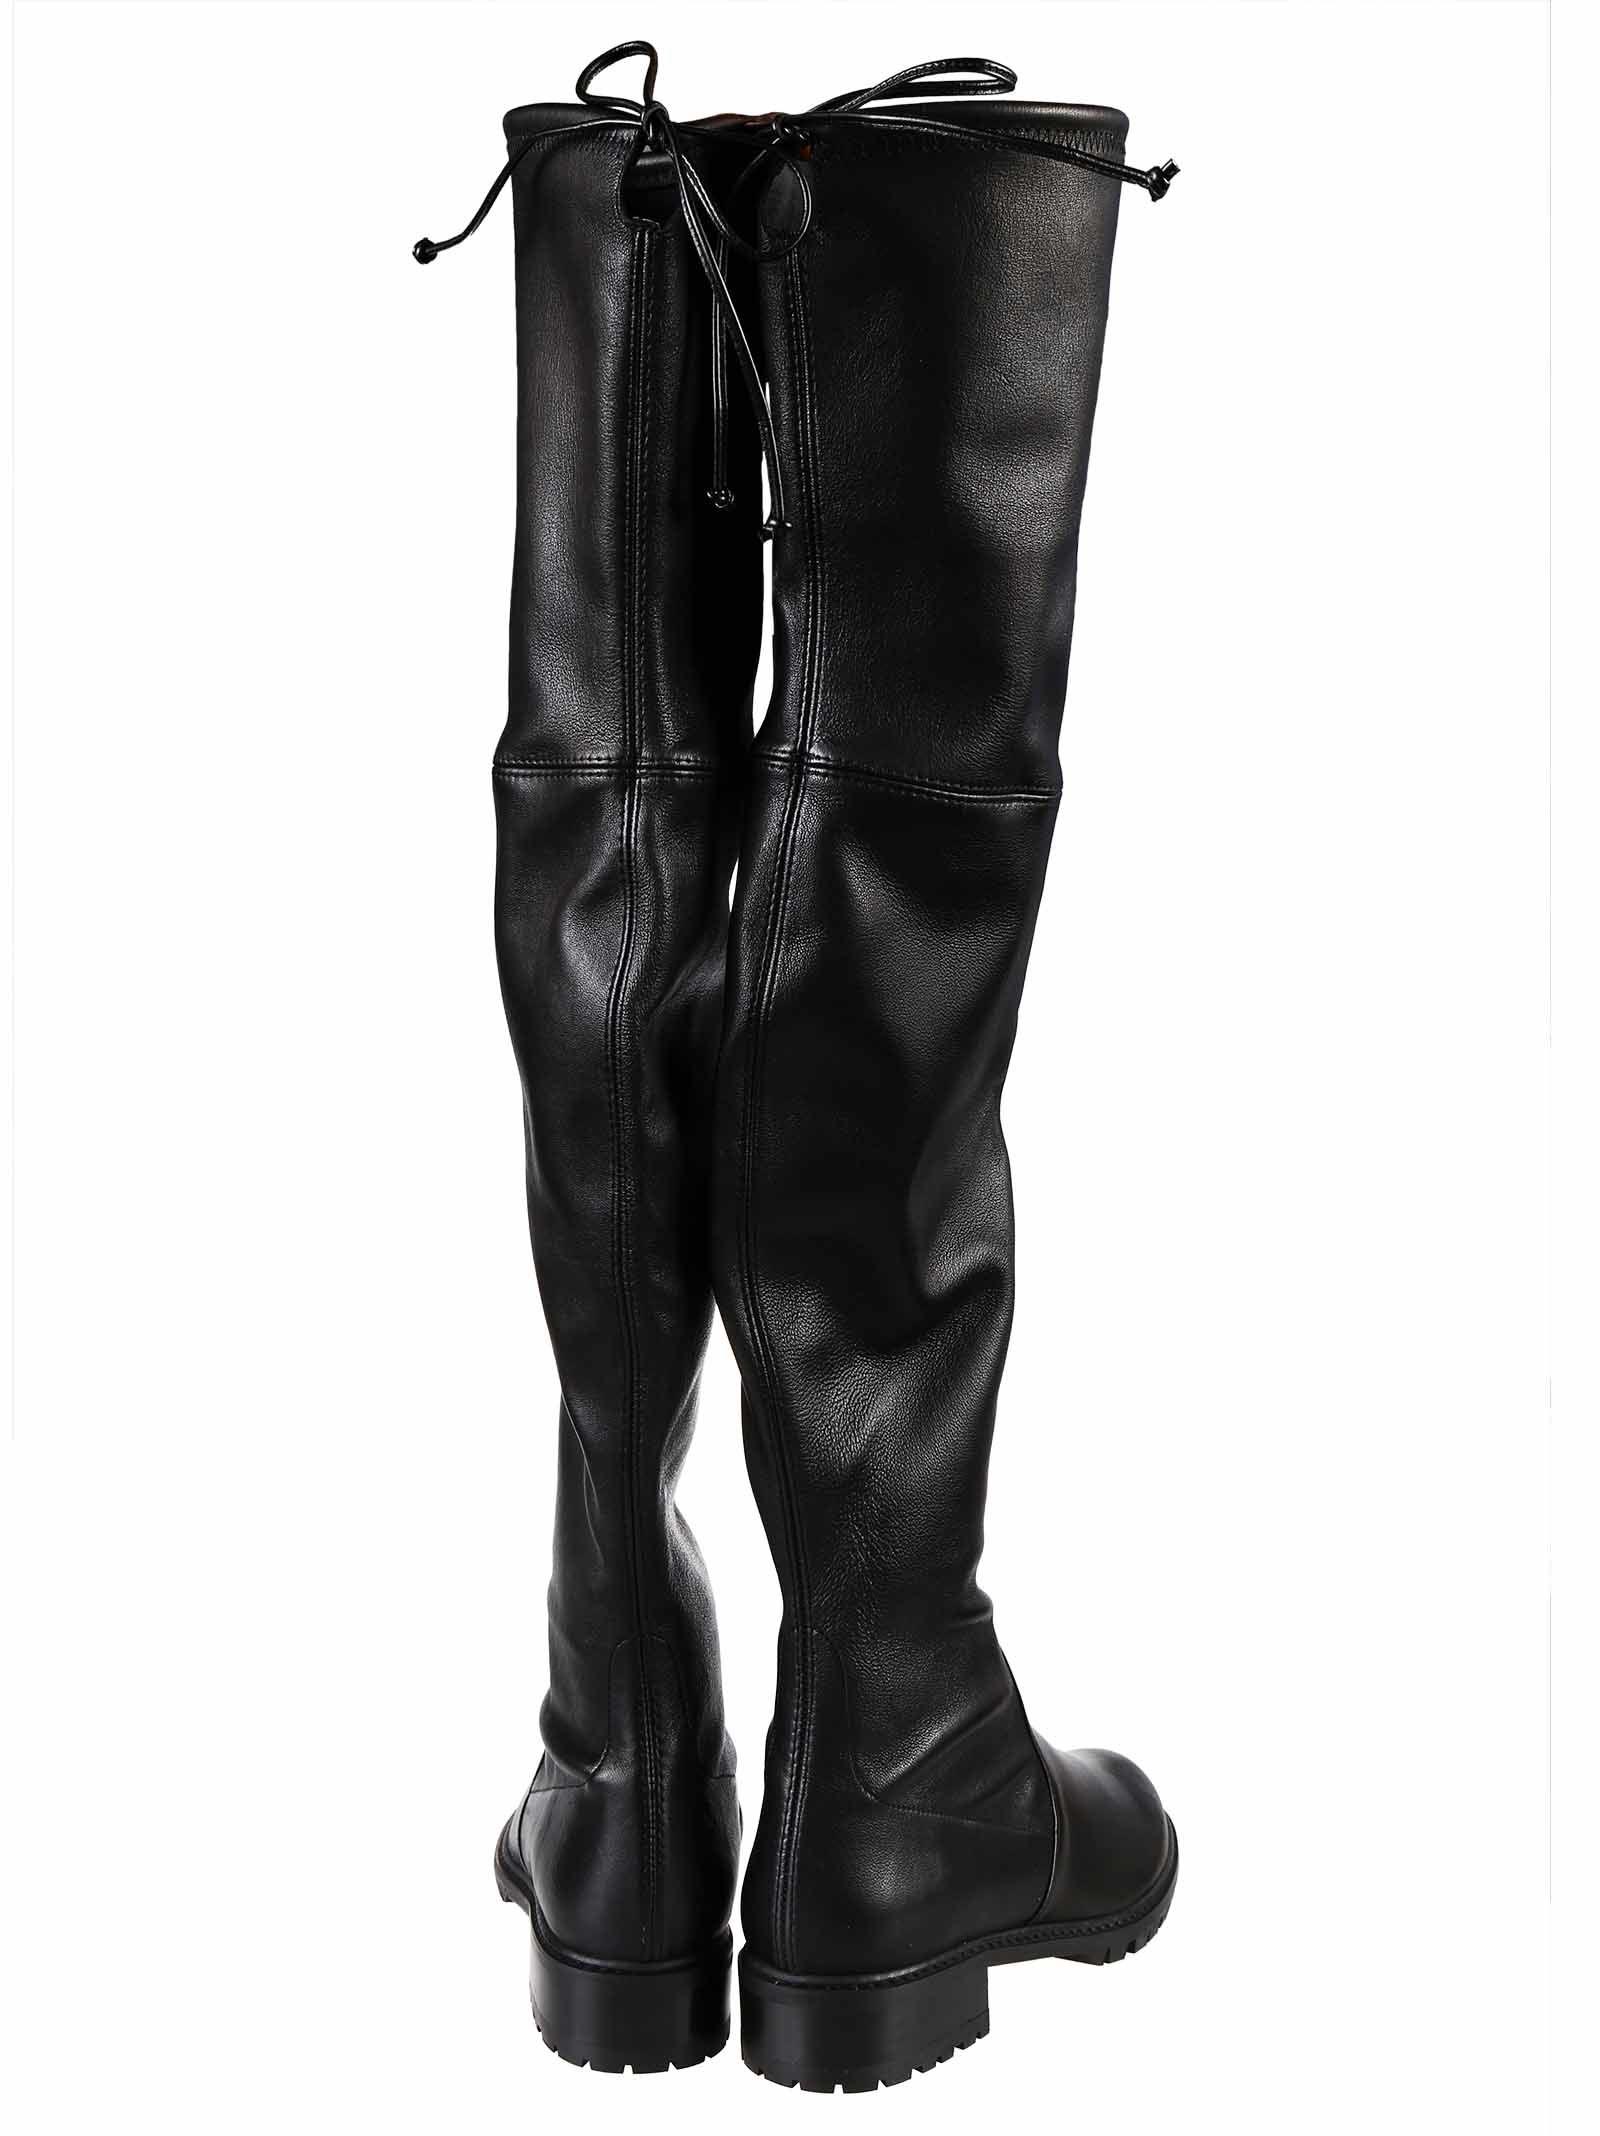 c936cce9c08 Stuart Weitzman Stuart Weitzman Lowland Over-the-Knee Boots - Black ...